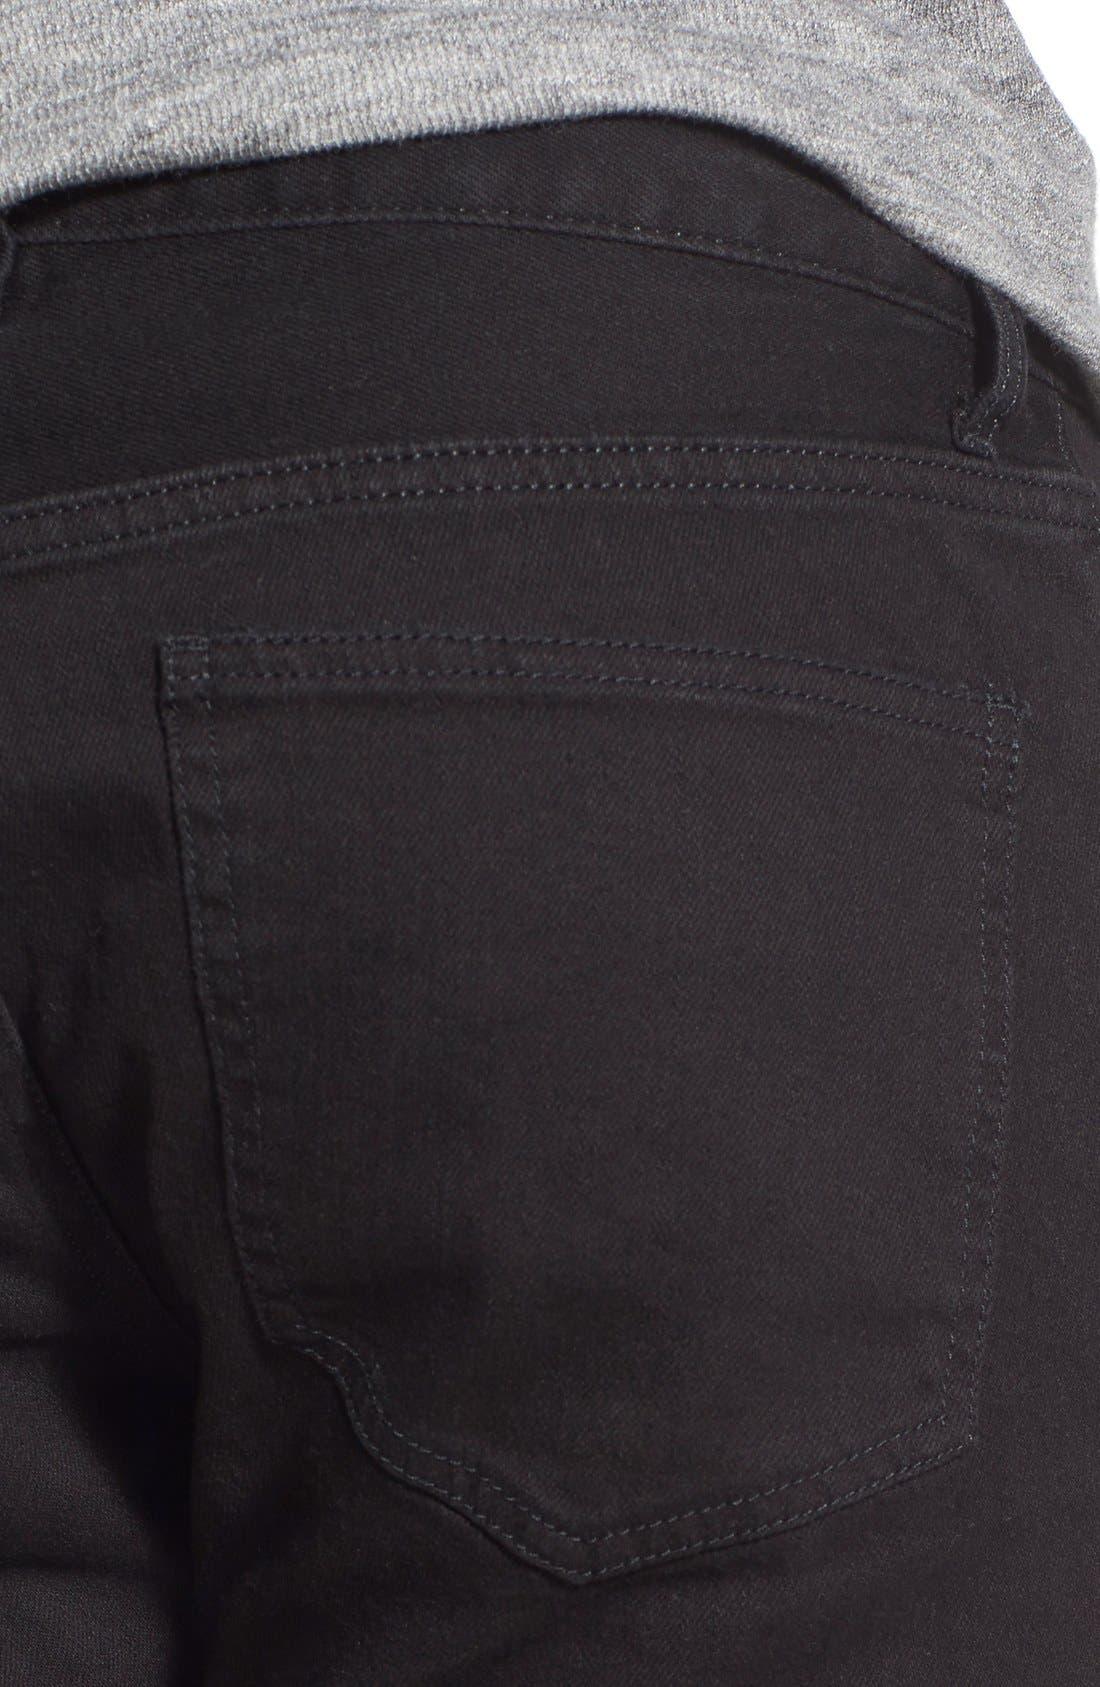 Skinny Fit Jeans,                             Alternate thumbnail 5, color,                             001